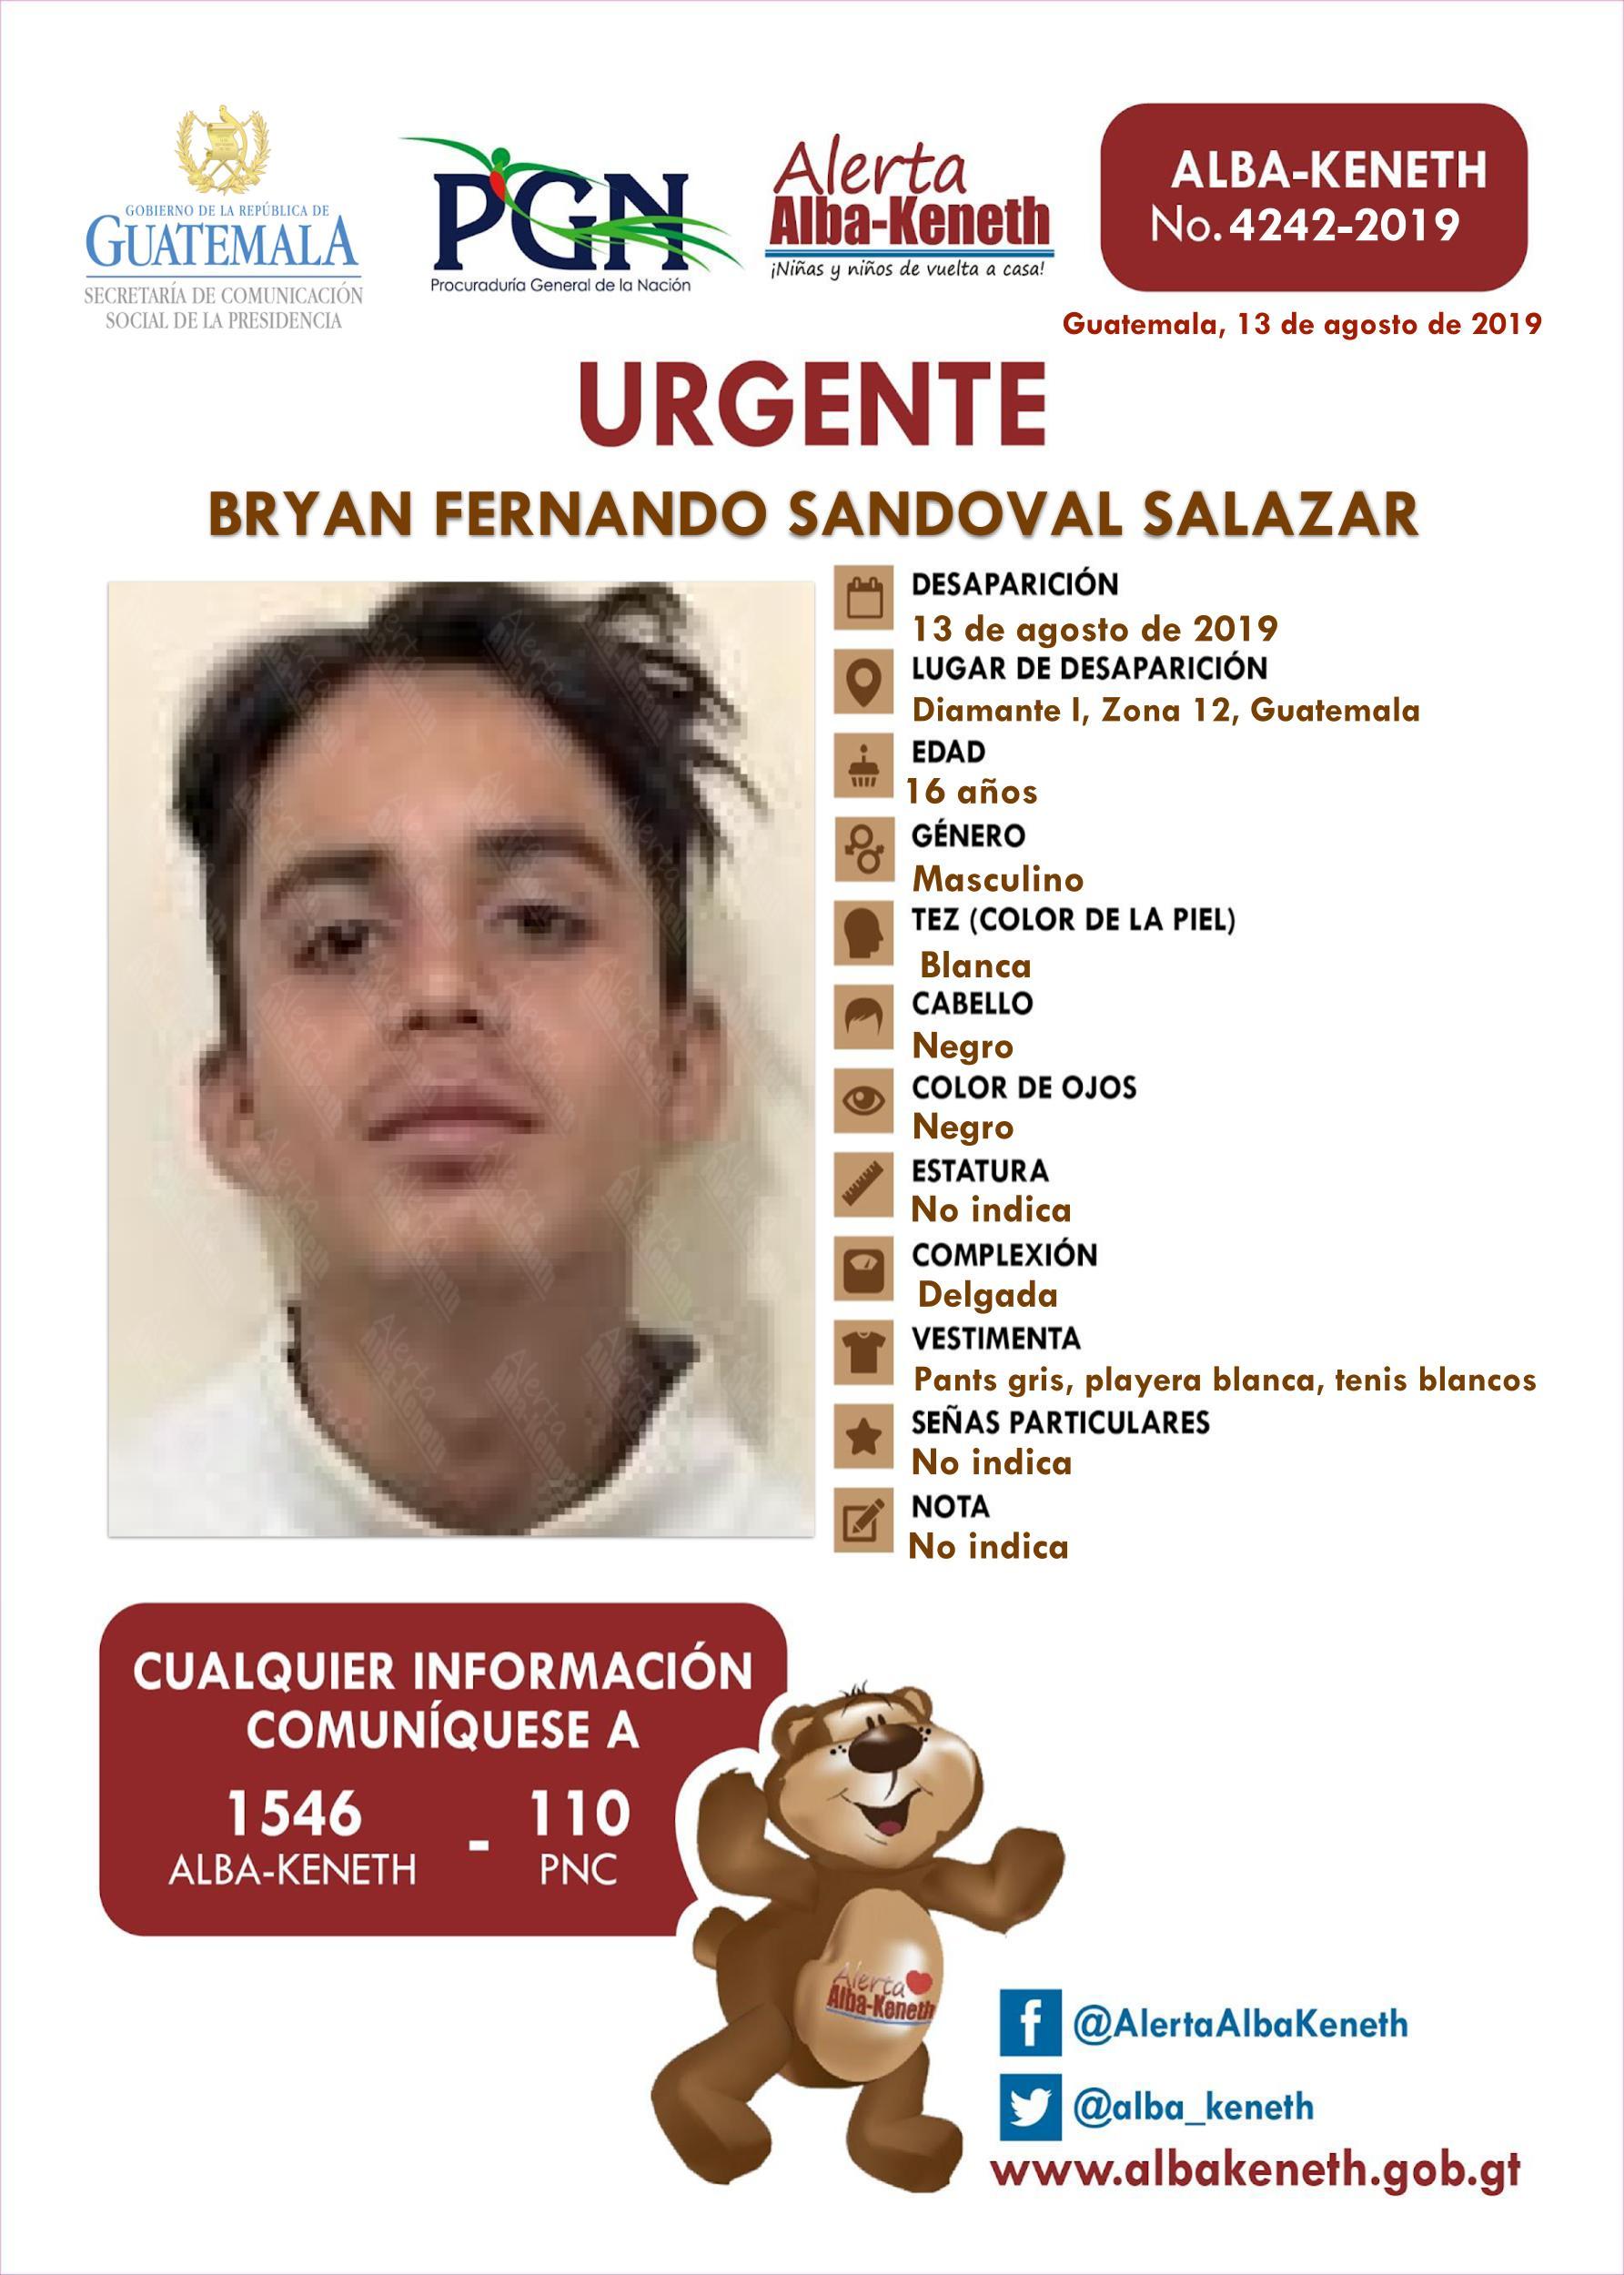 Bryan Fernando Sandoval Salazar